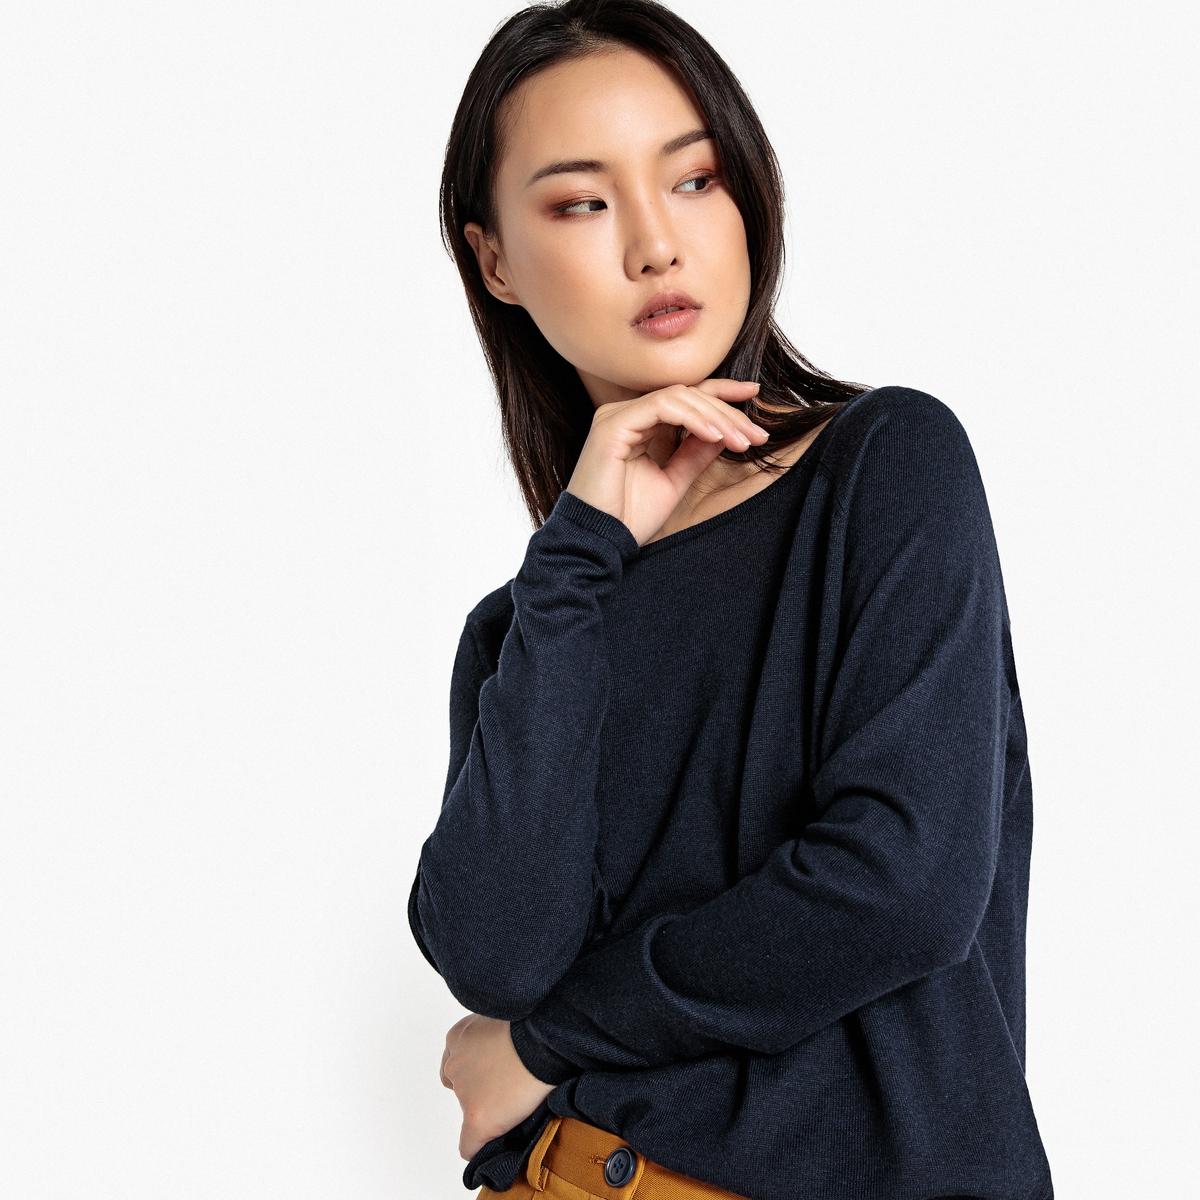 Пуловер с вырезом-лодочкой, форма футляра